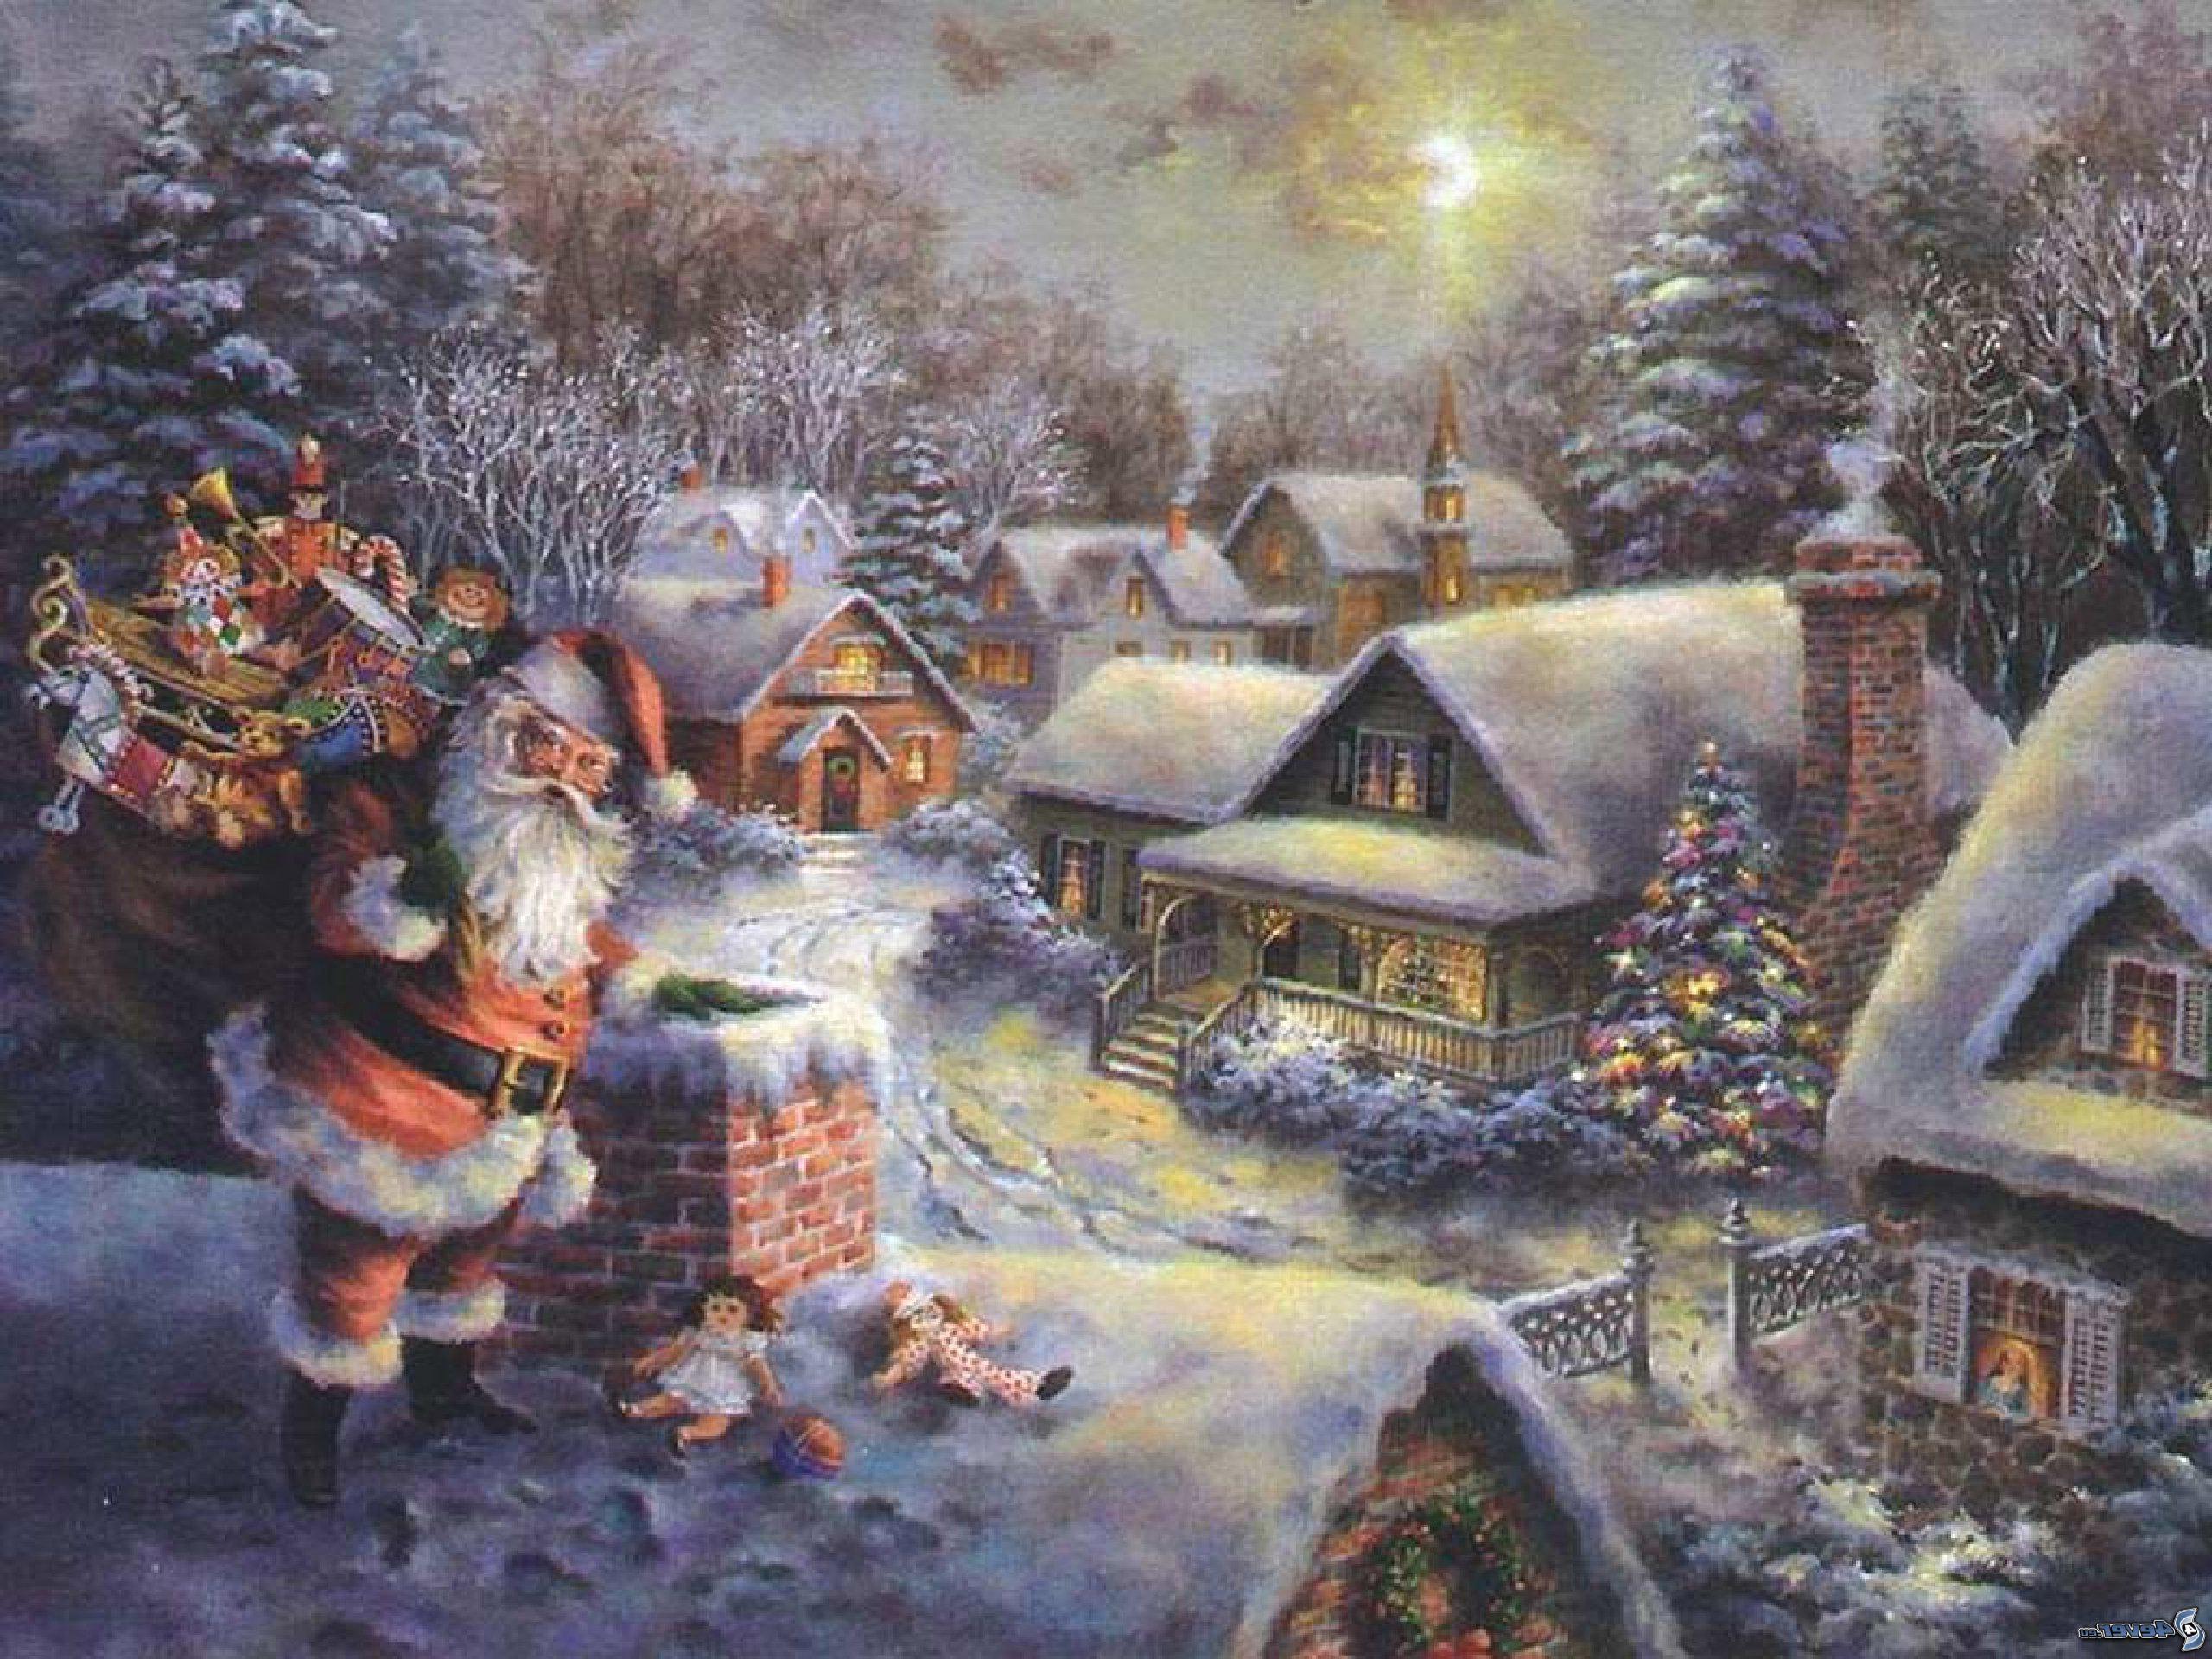 Новый год 2019, Санта Клаус, Дед мороз, подарки